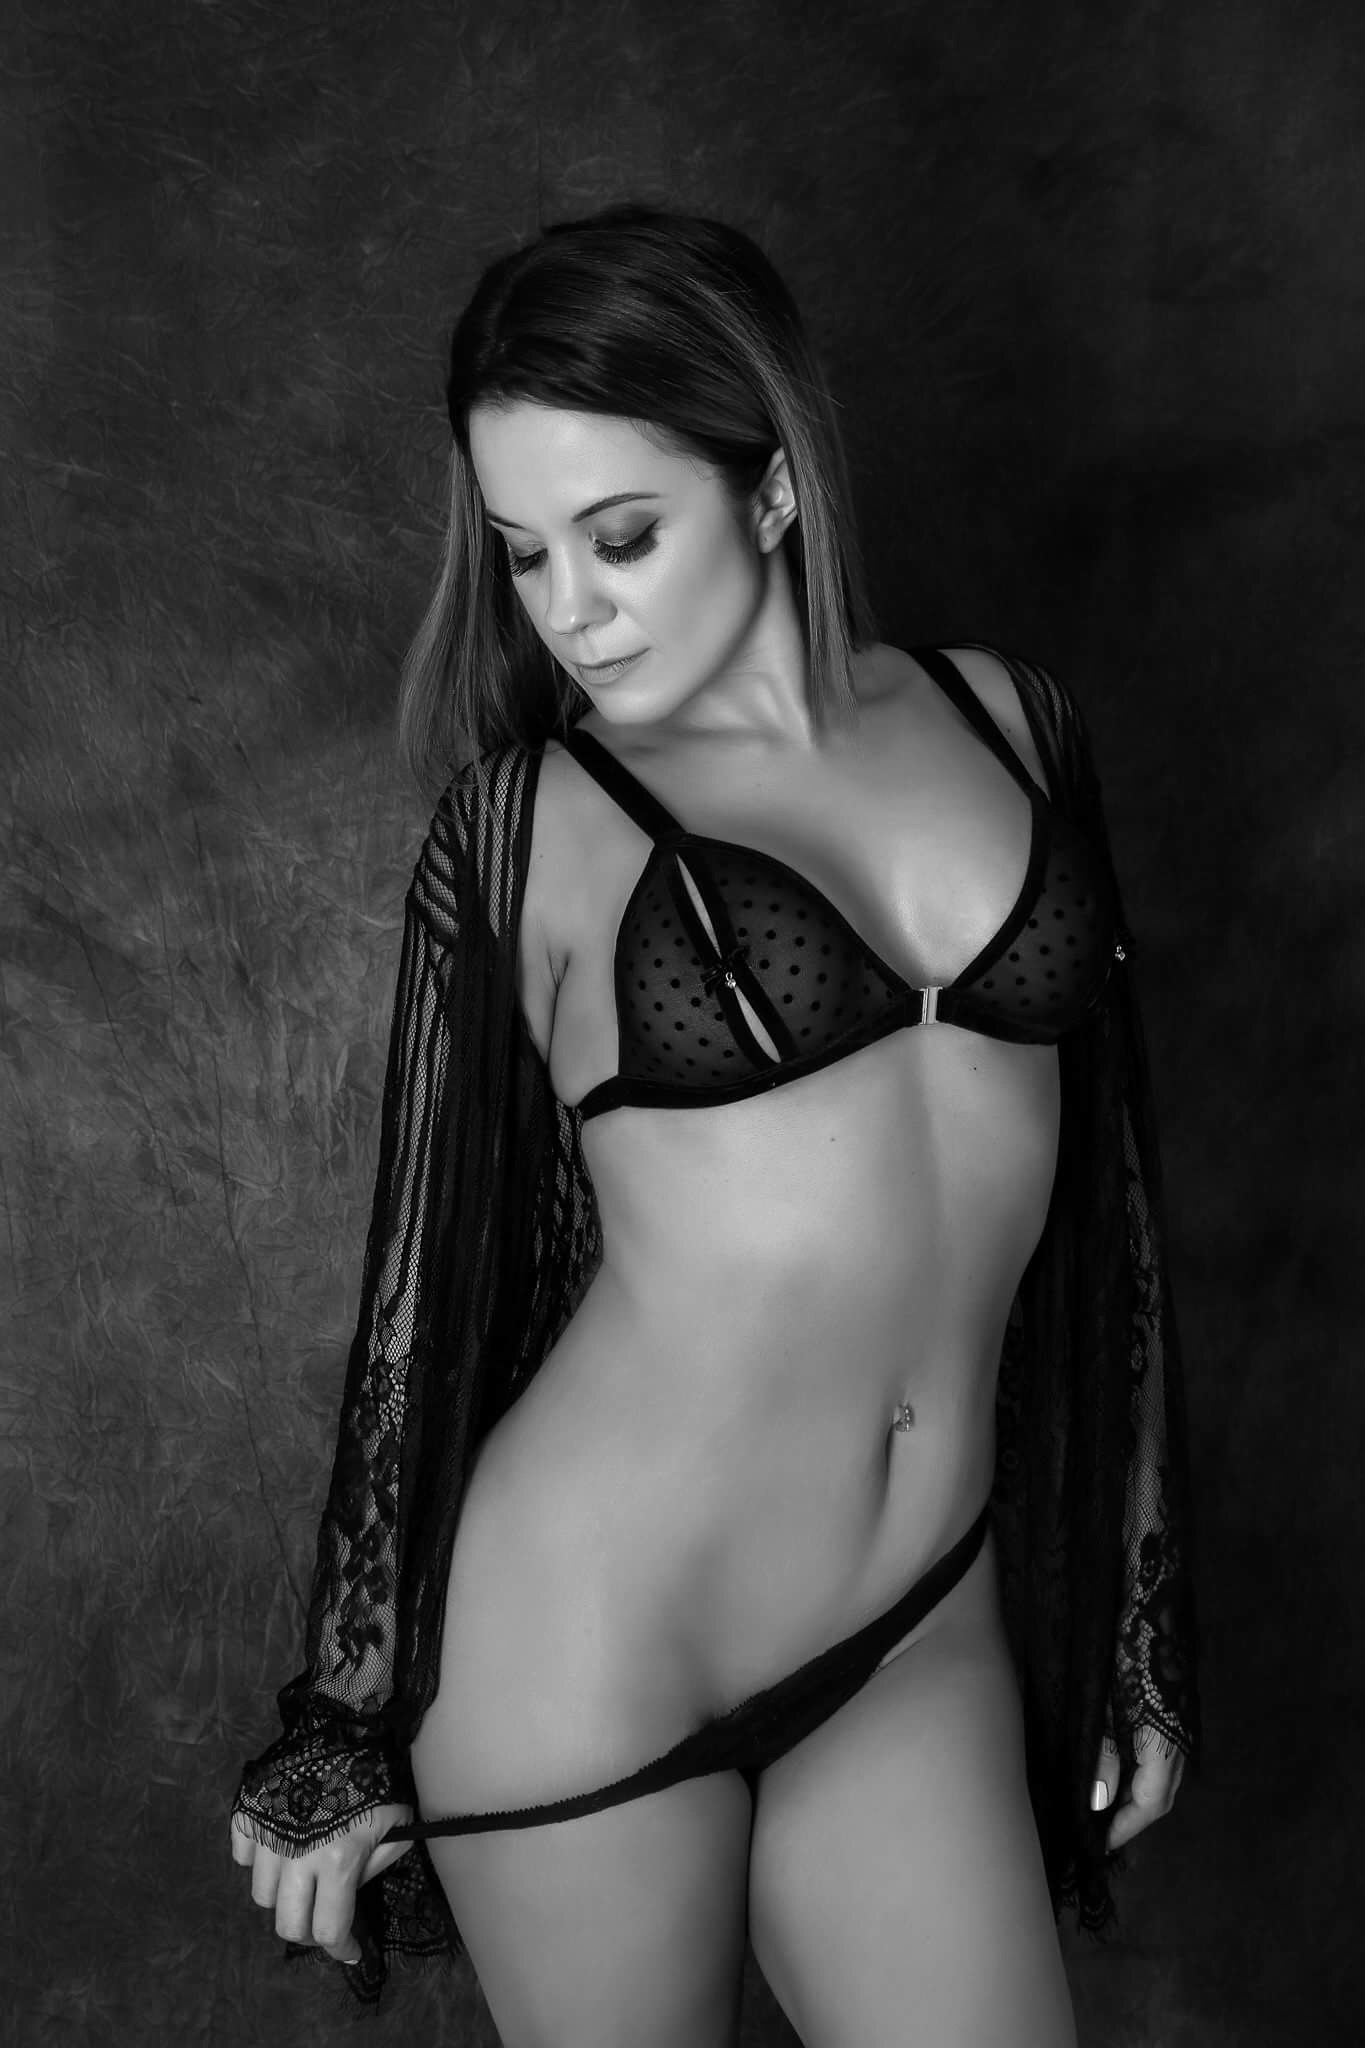 Female Stripper - Charlie